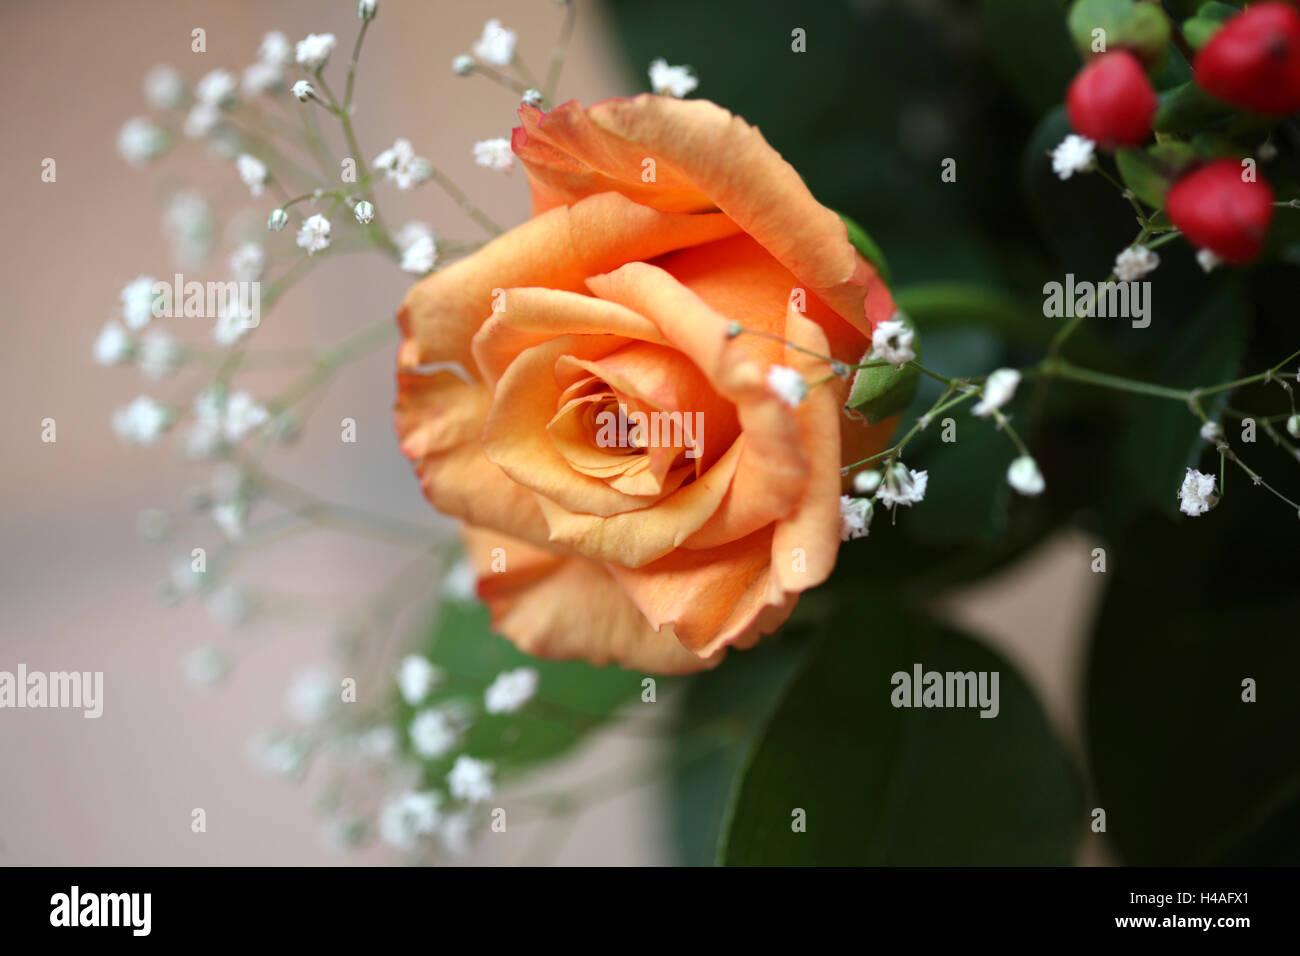 flowers, rose, Stock Photo